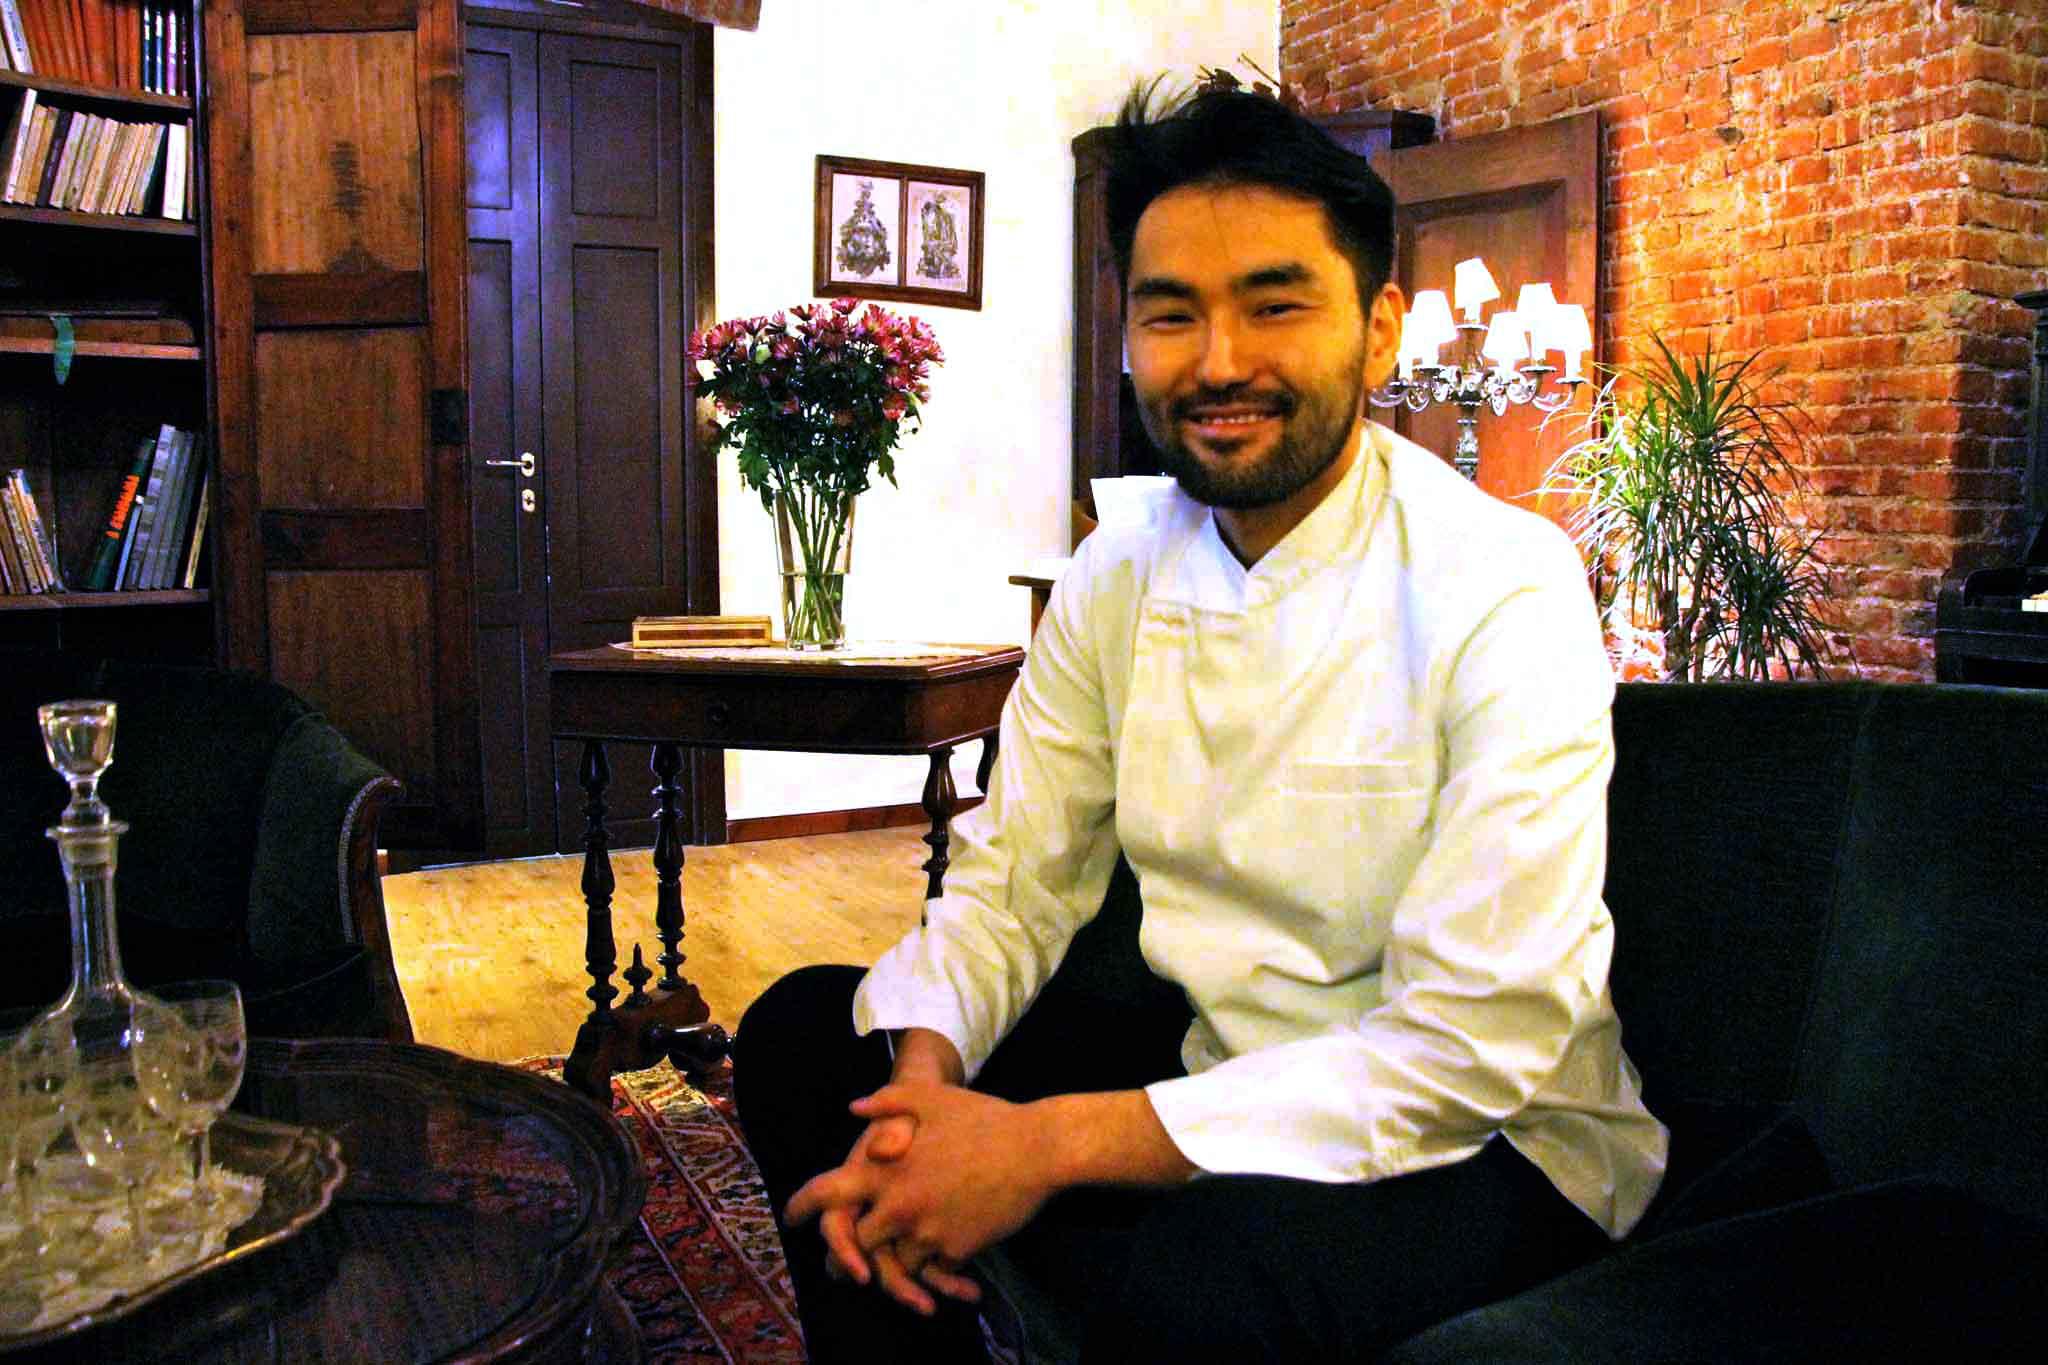 Takeshi Iwai